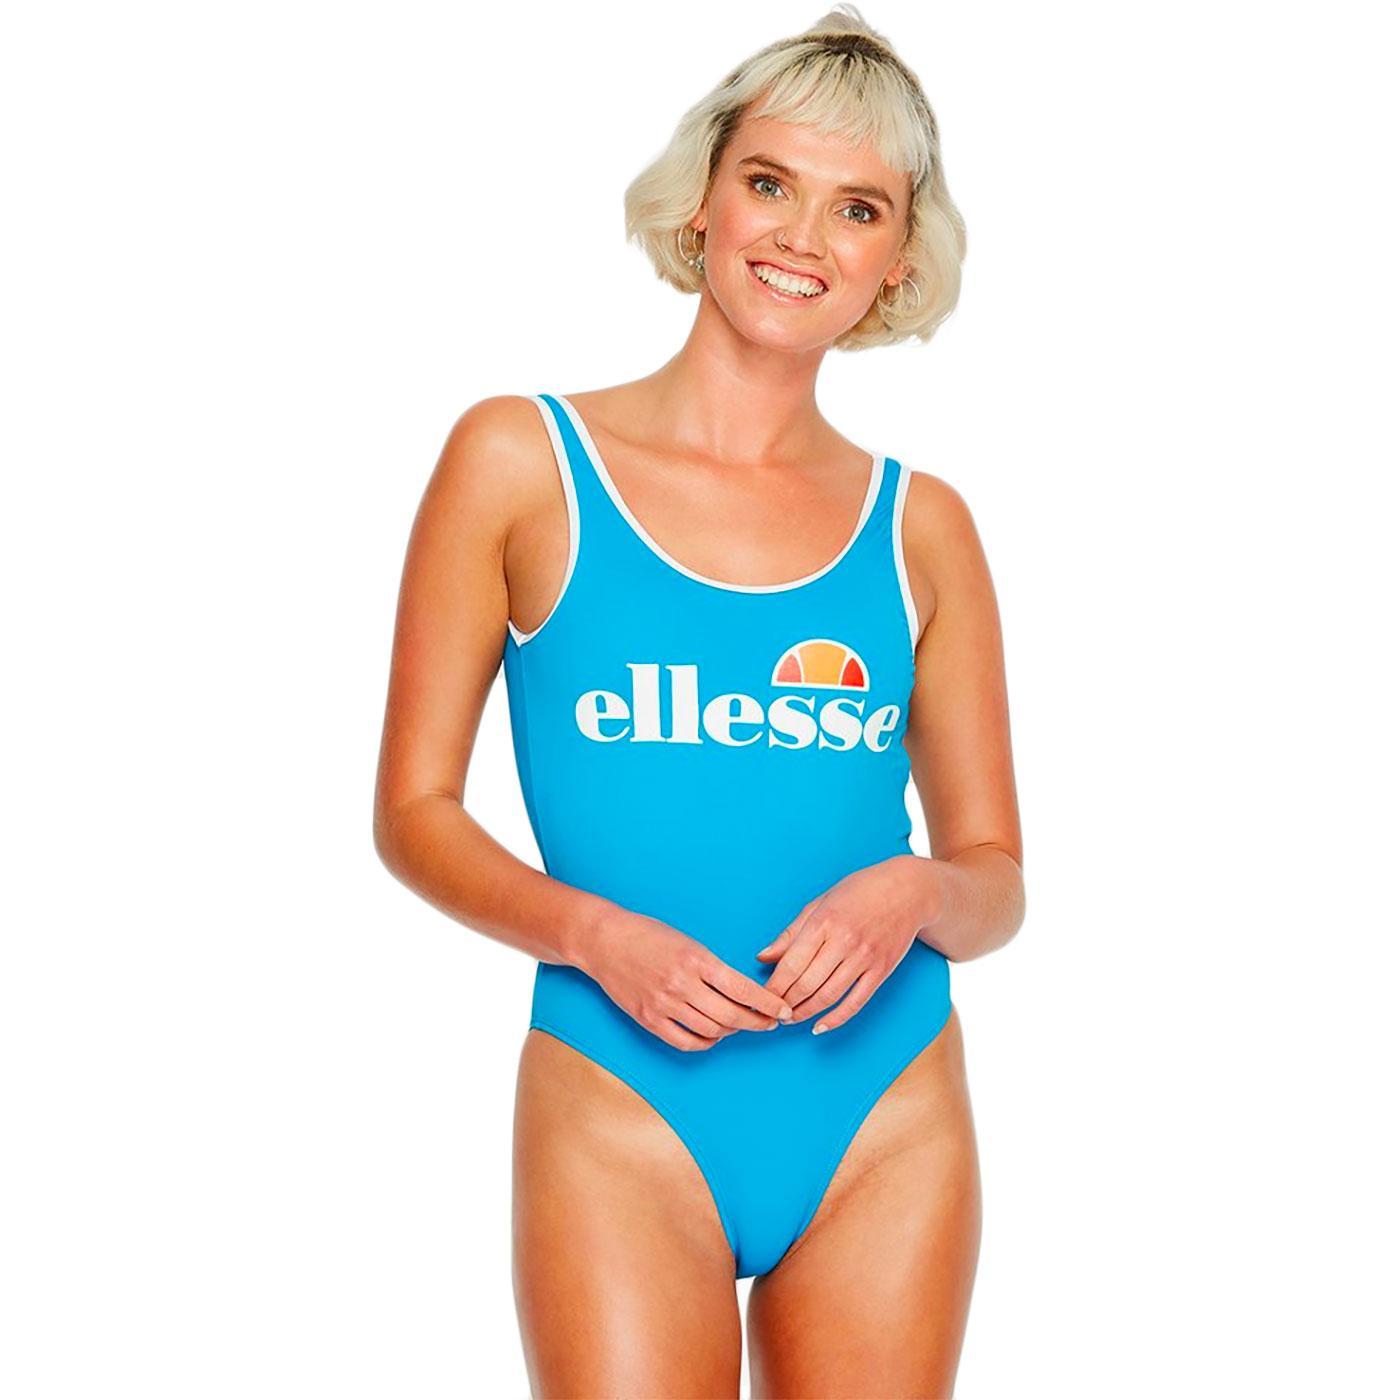 Lilly ELLESSE Retro 80s Beach Sport Swim Suit BLUE